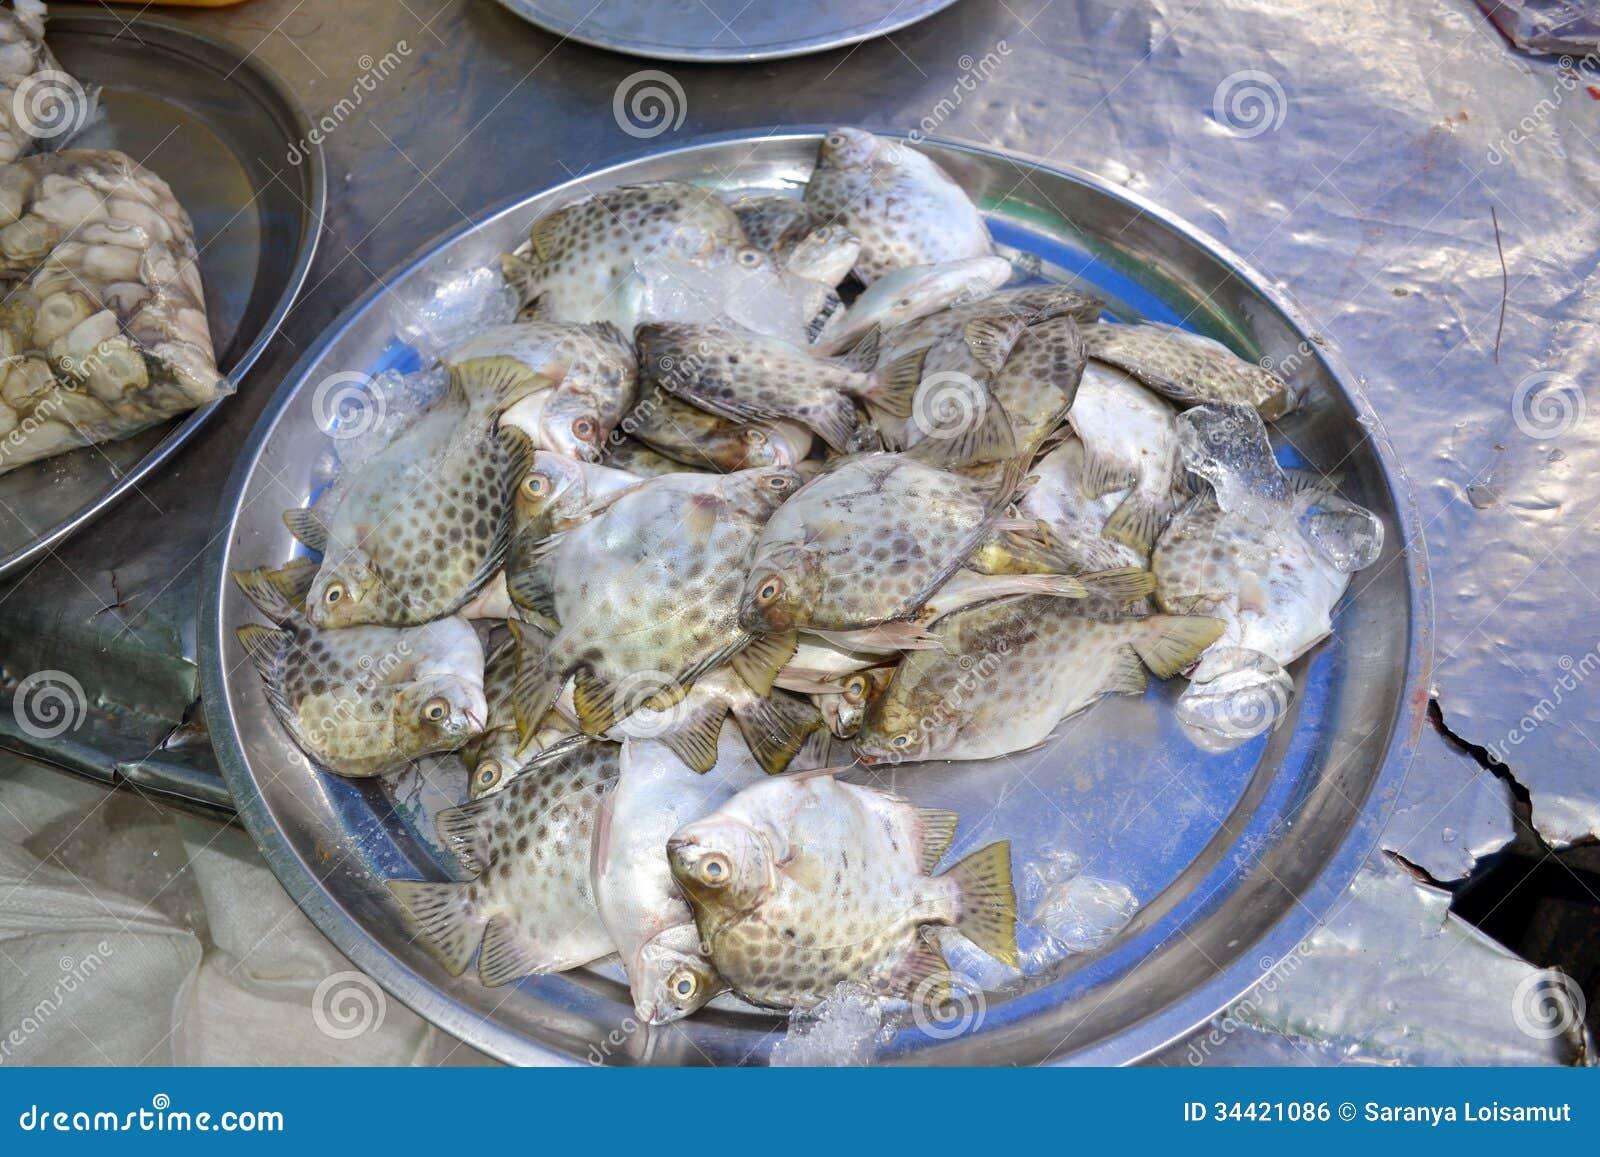 Fish stock photo image of ocean fishs material marine for Brackish water fish